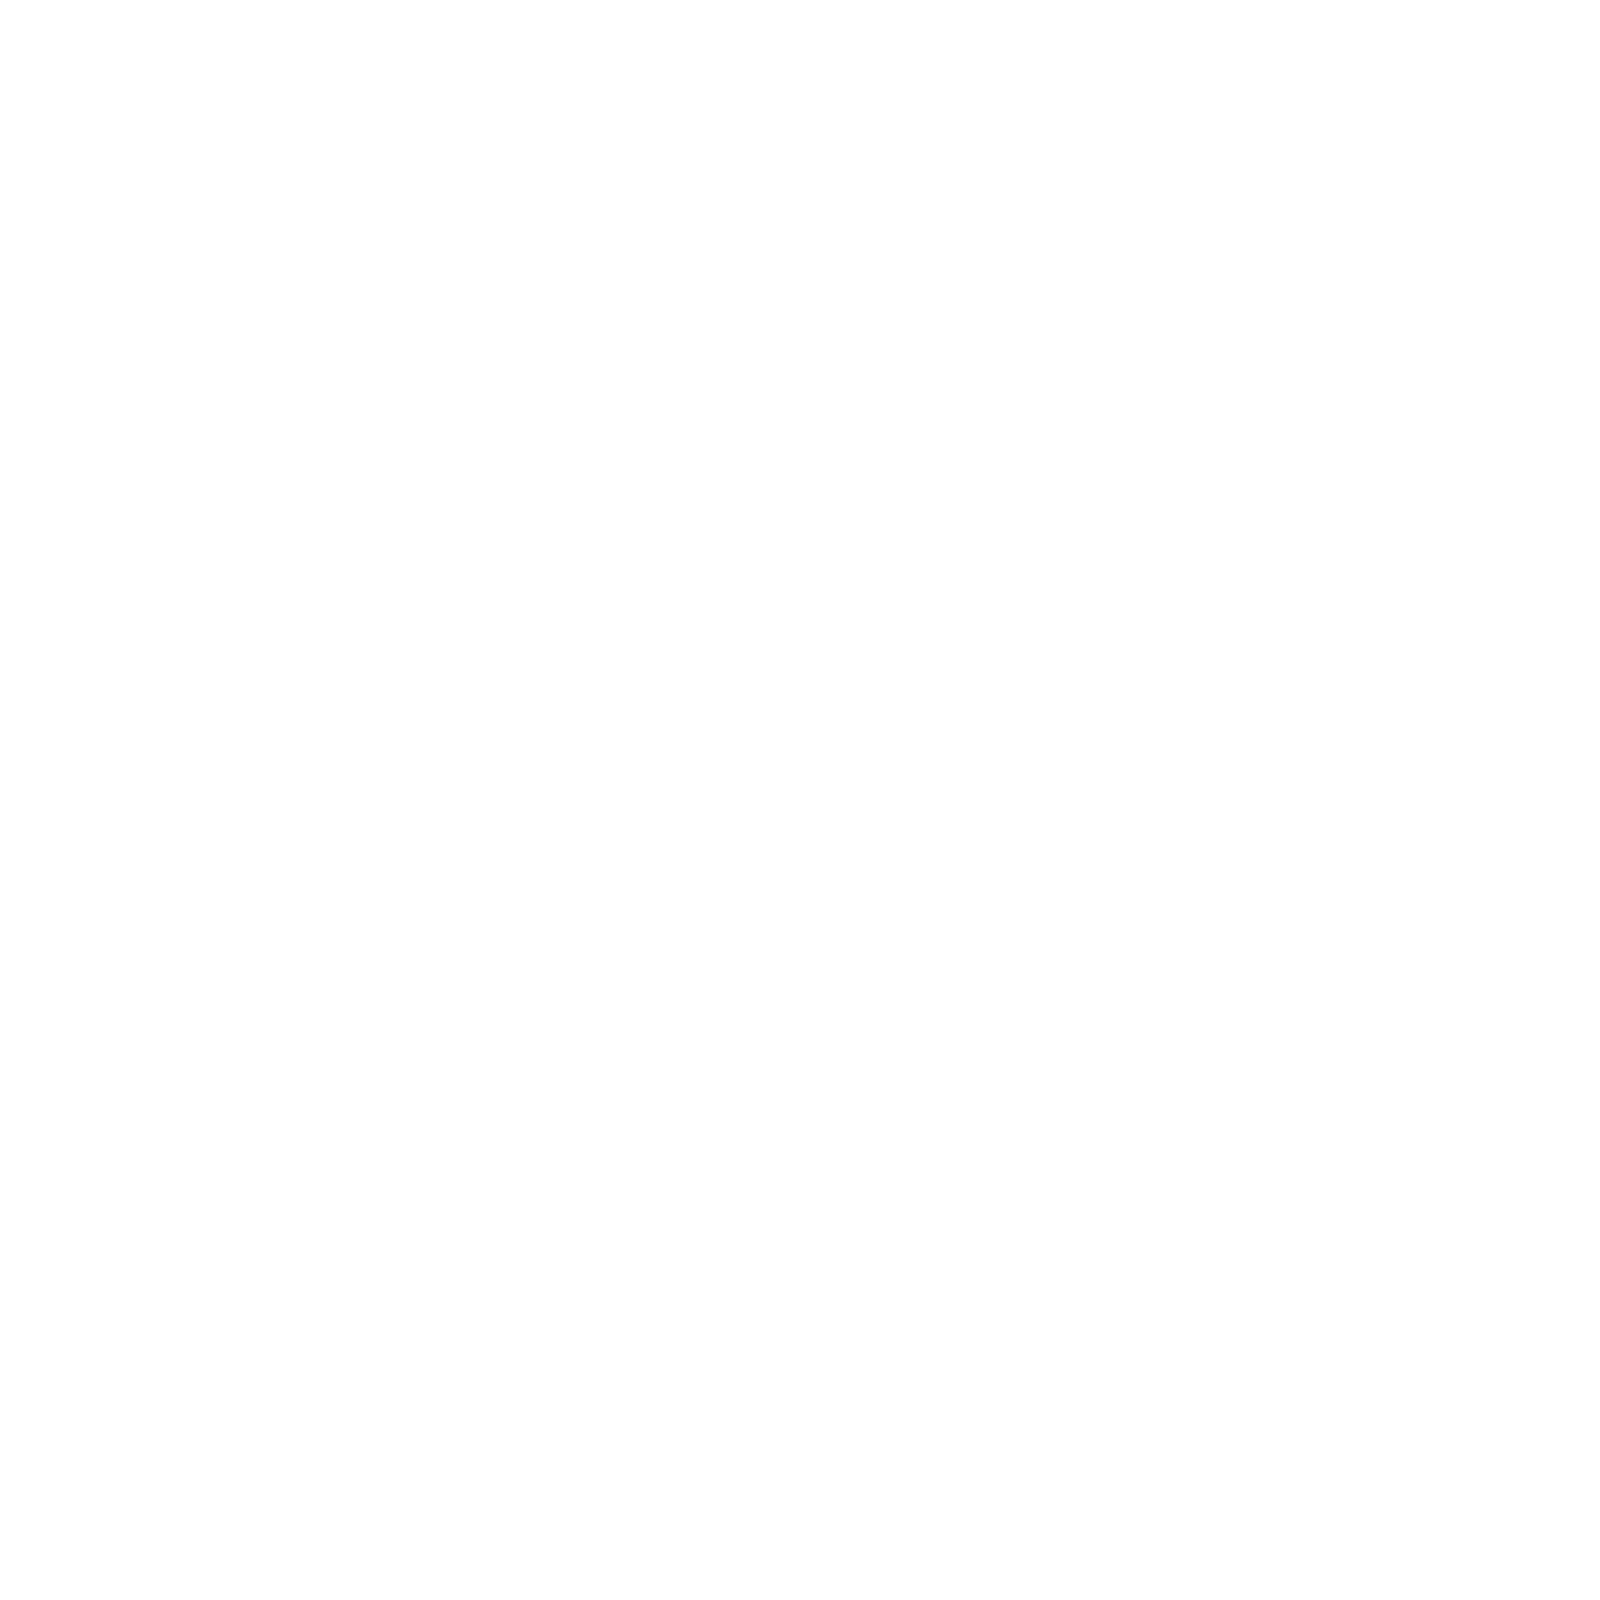 Hines Digital